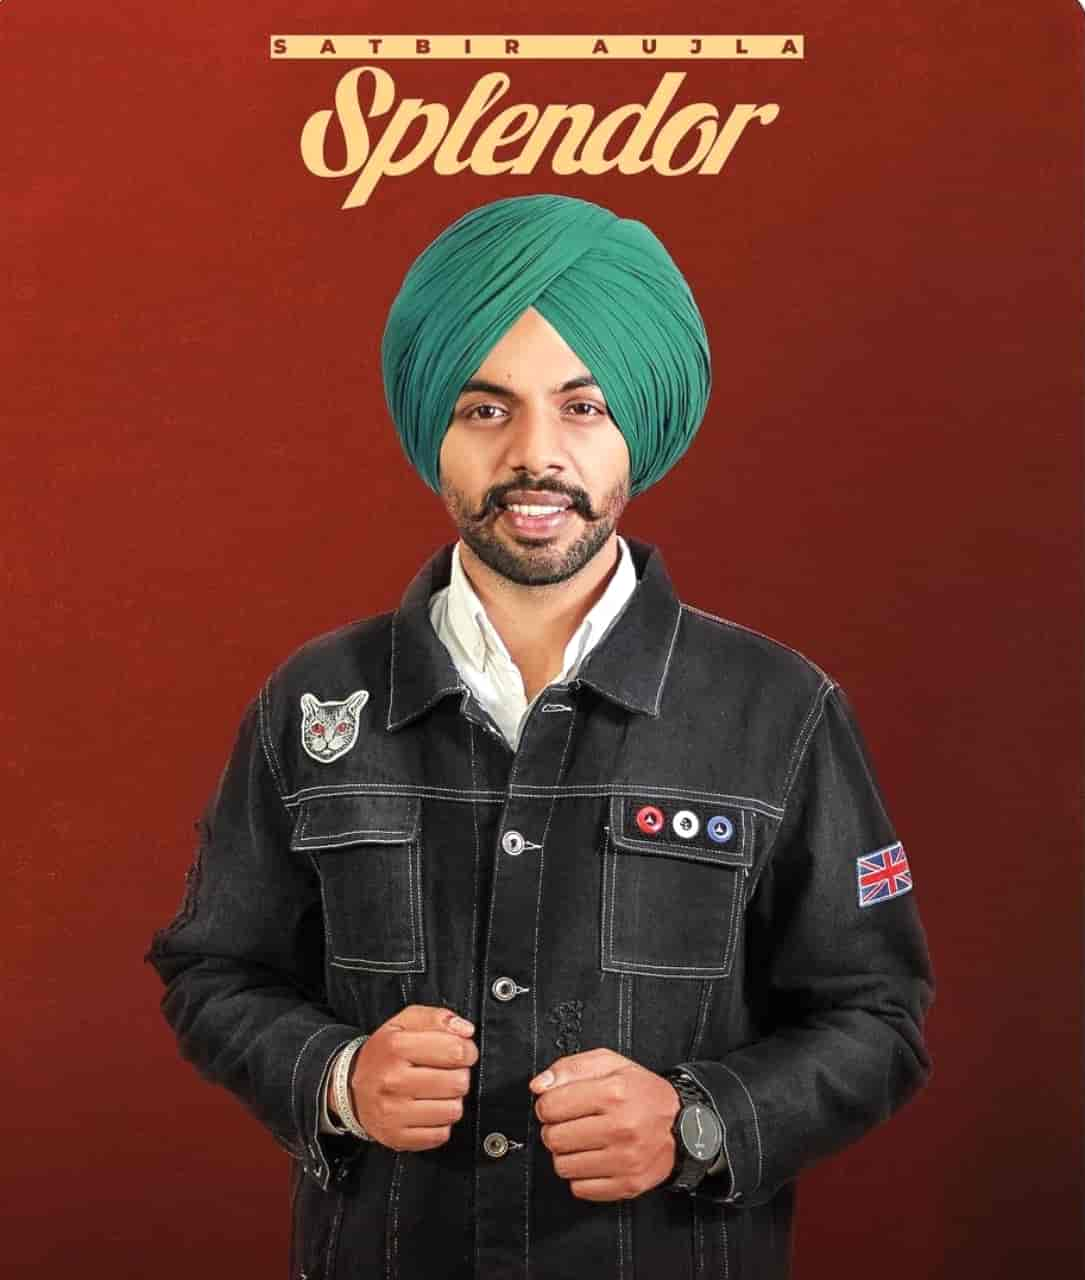 Splendor Punjabi Song Image Features Satbir Aujla